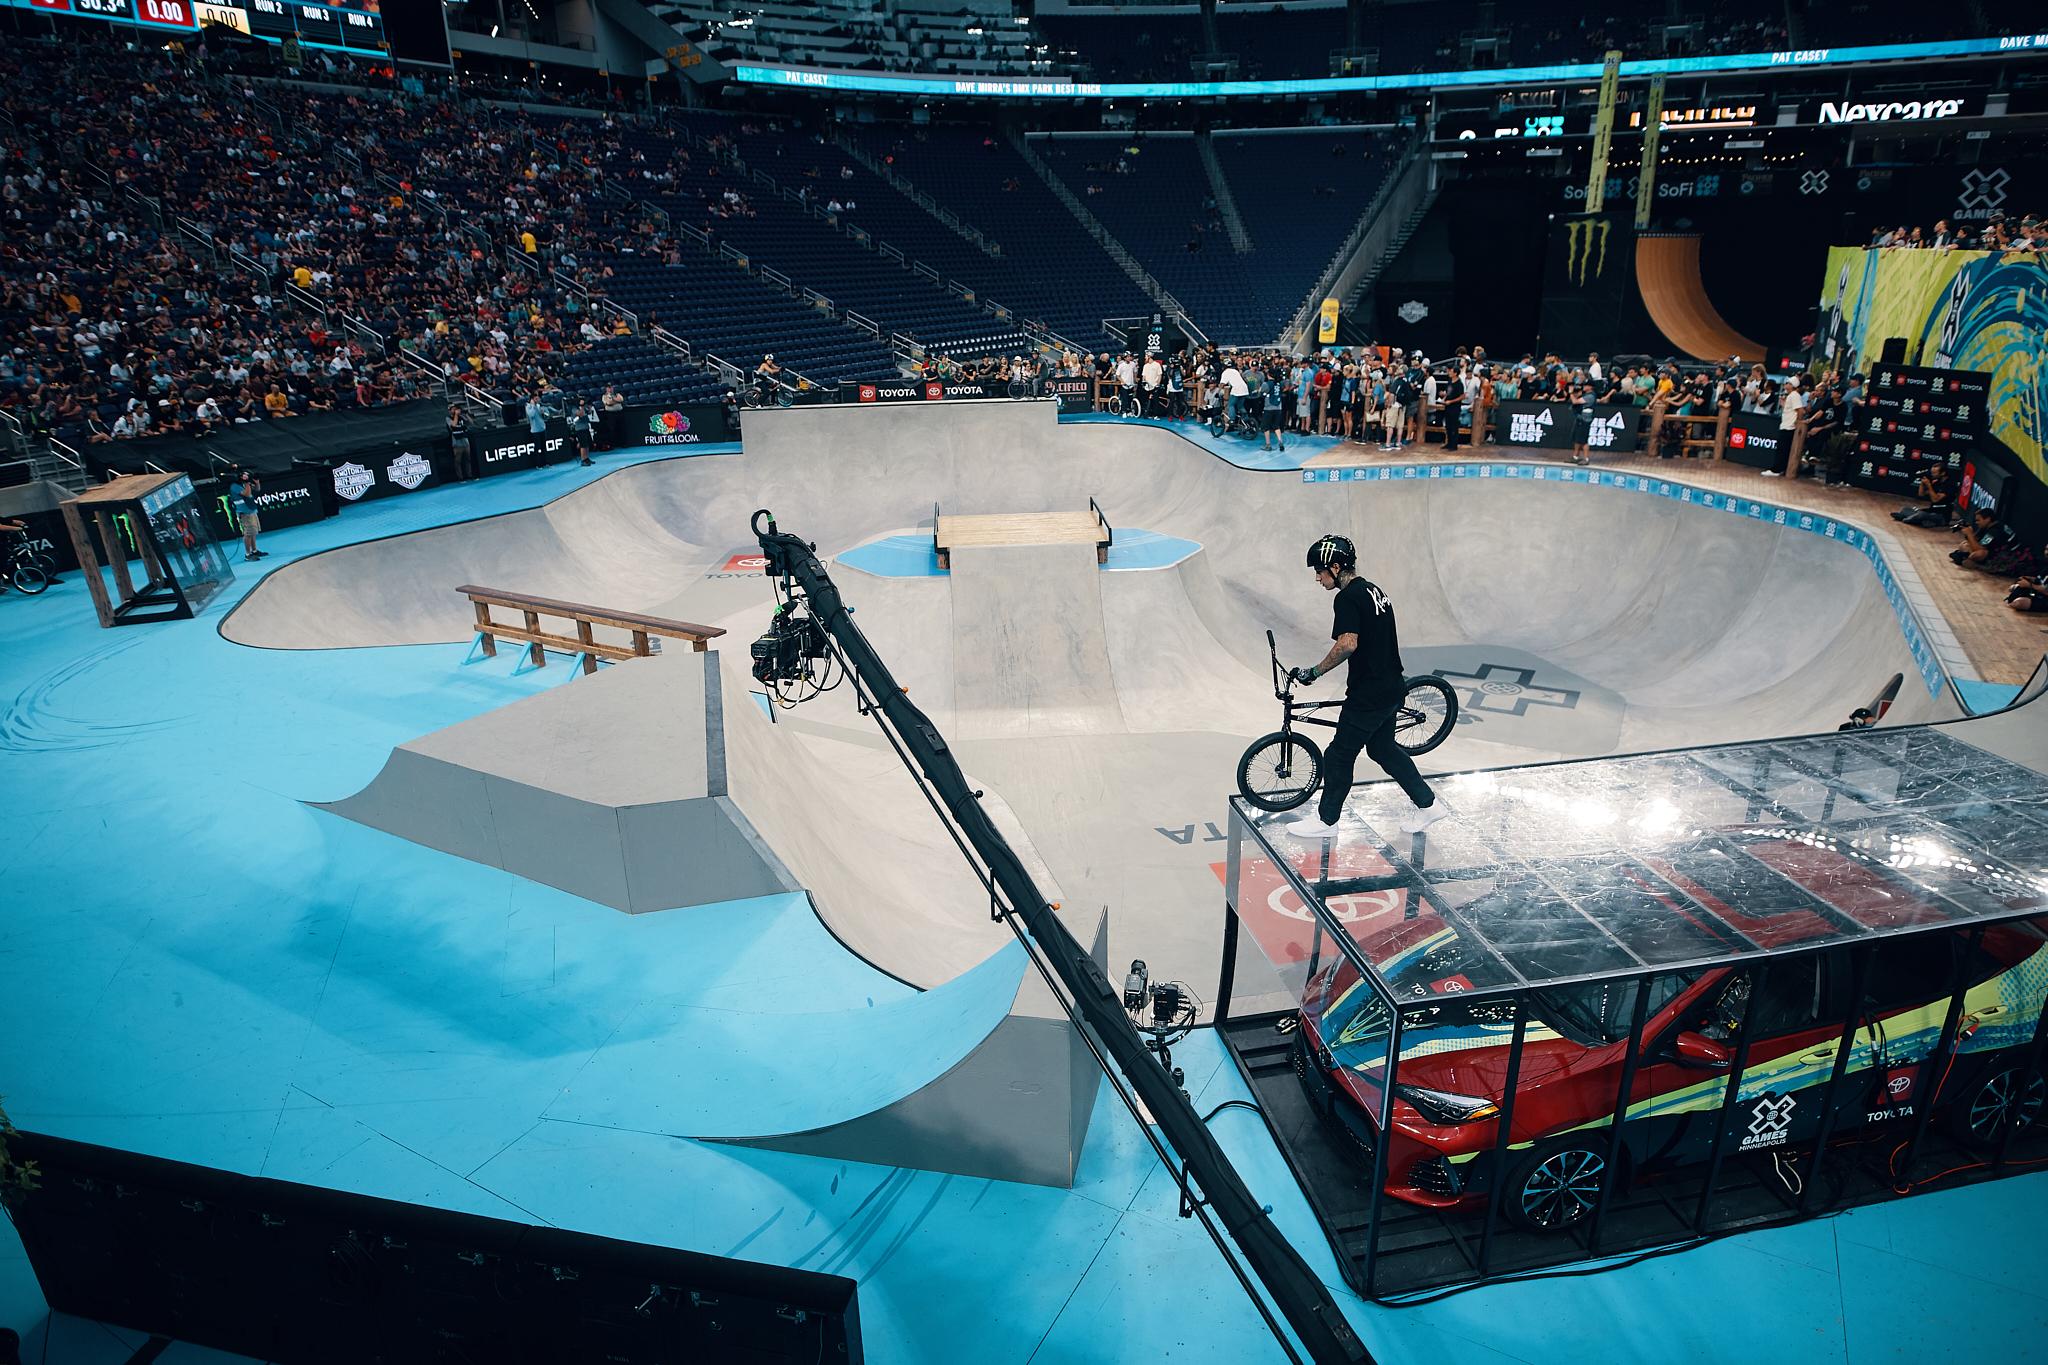 X_Games_2018_at_US-Bank_Stadium_Photo_By_Joe_Lemke_032.jpg